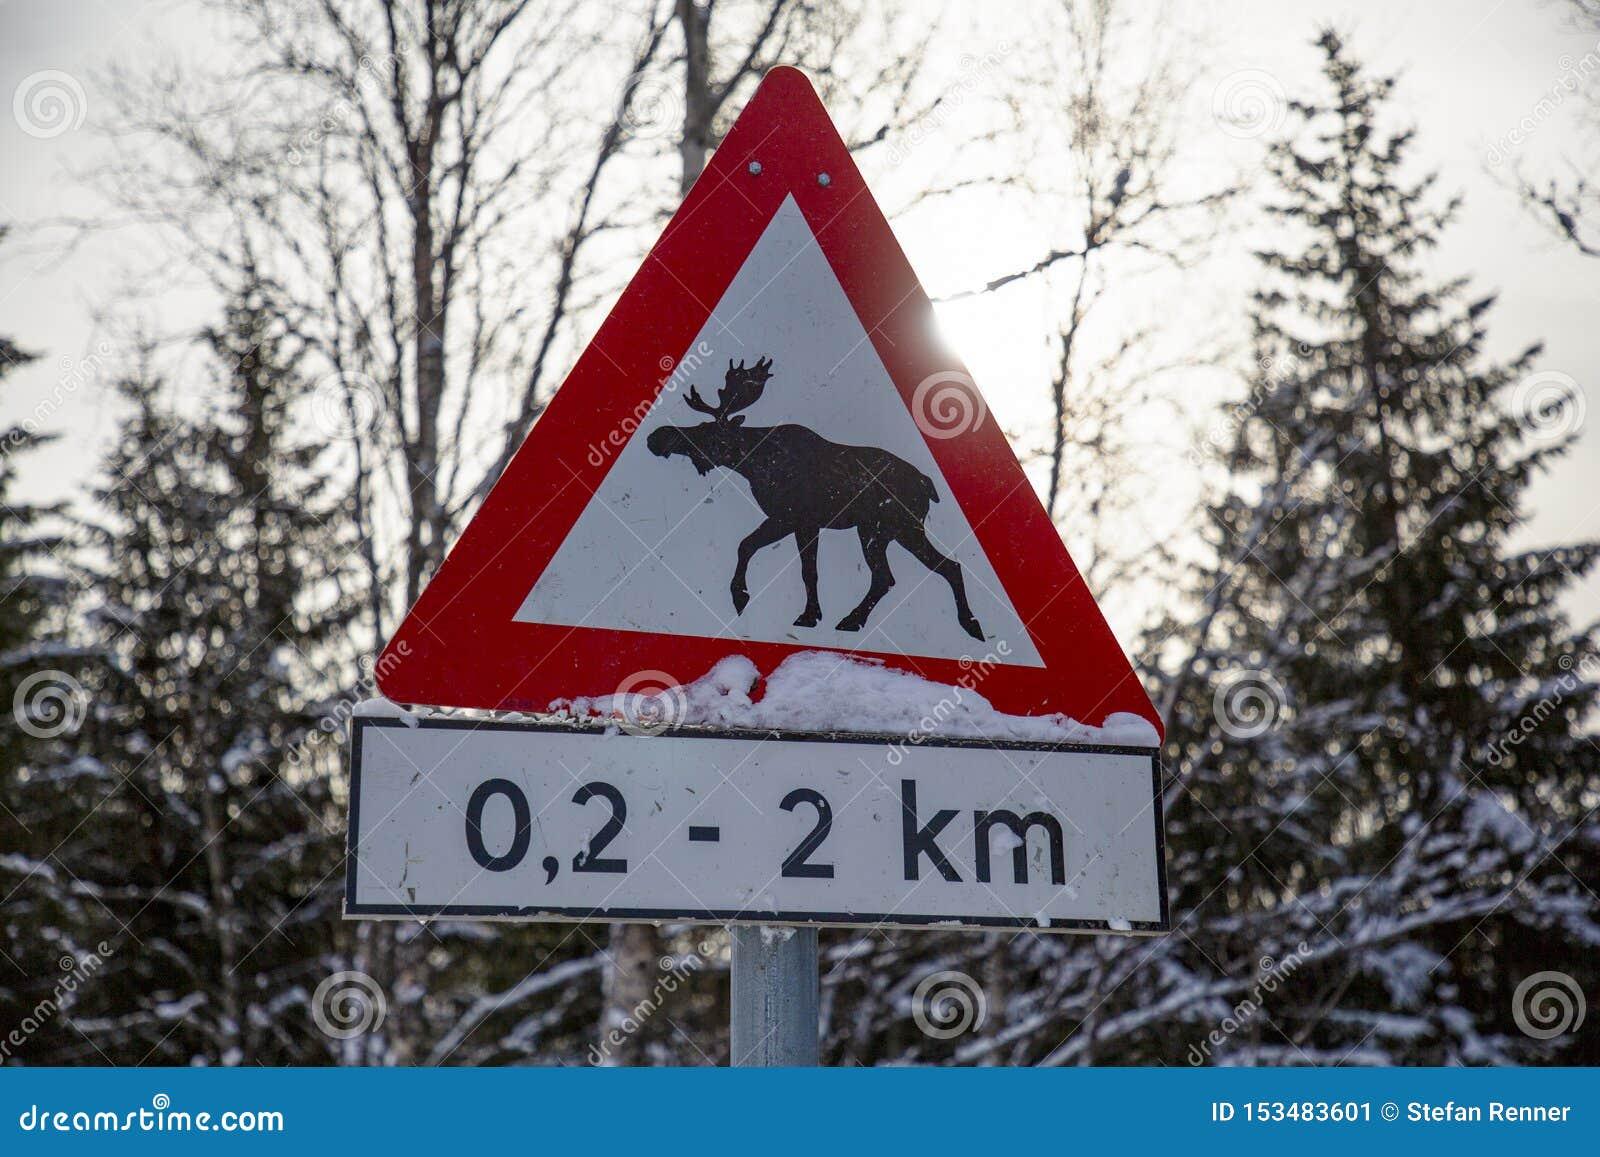 Alces do sinal de estrada